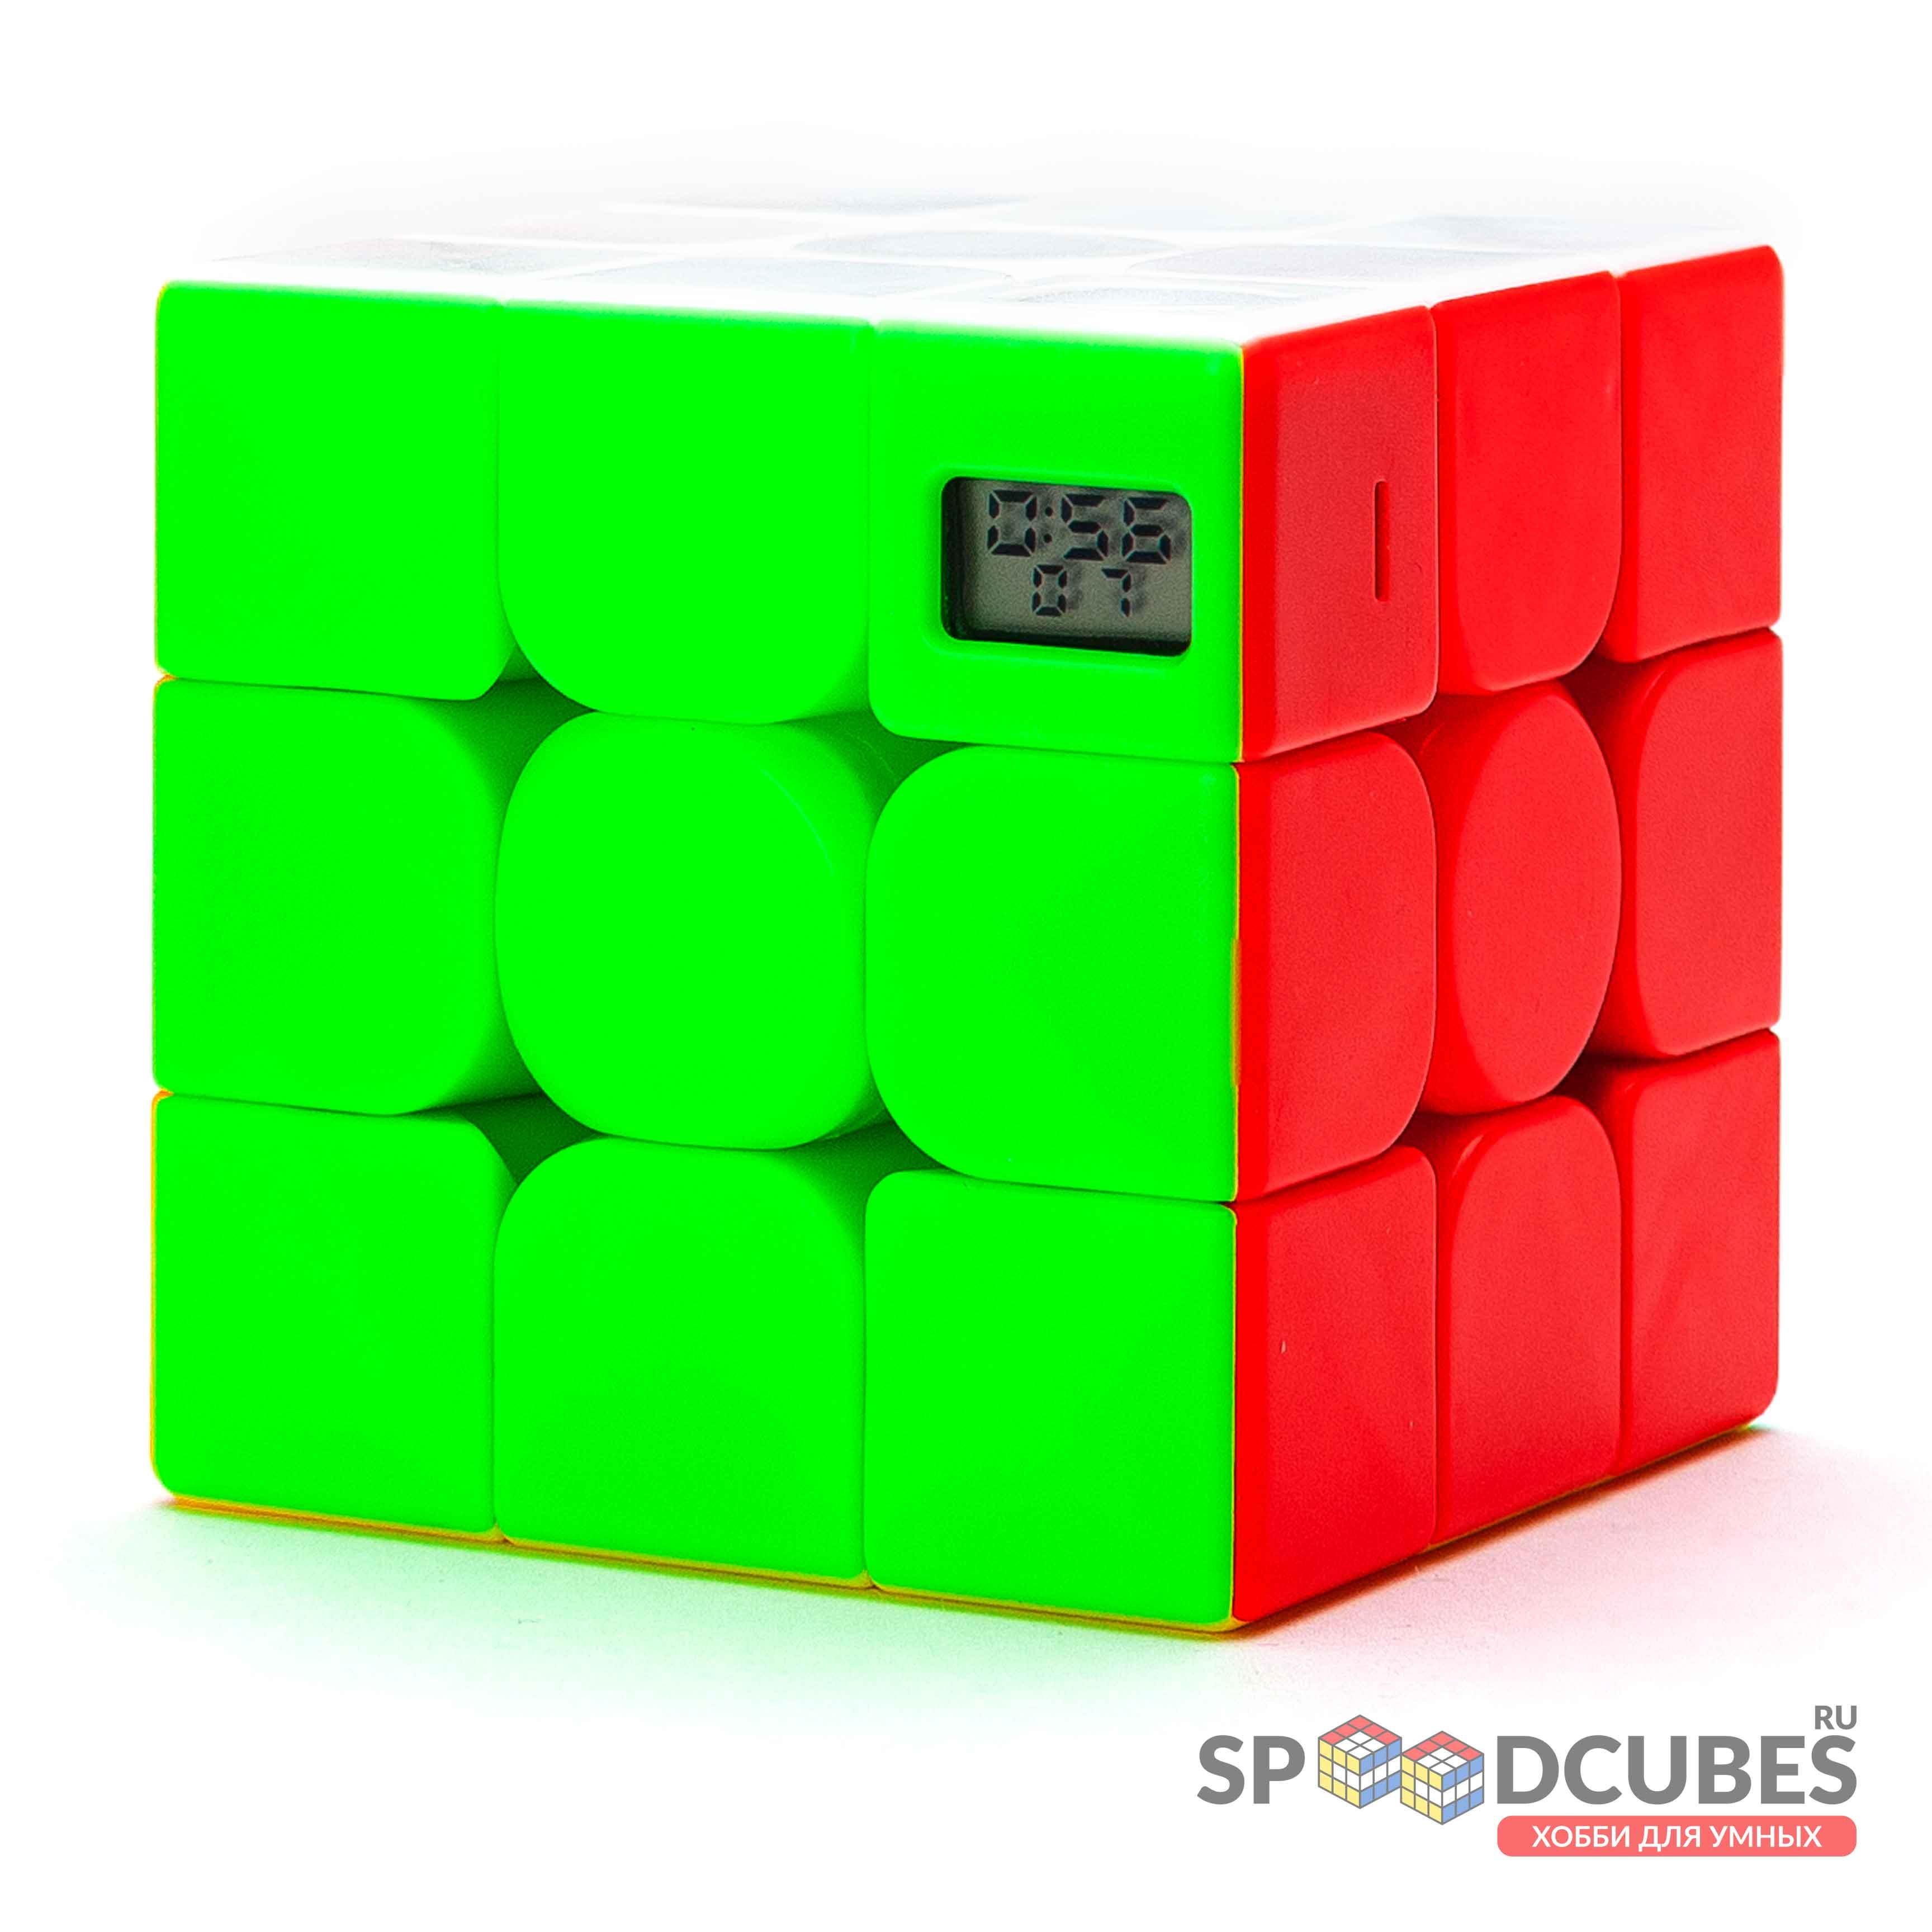 MoYu Meilong 3x3 Timer Cube